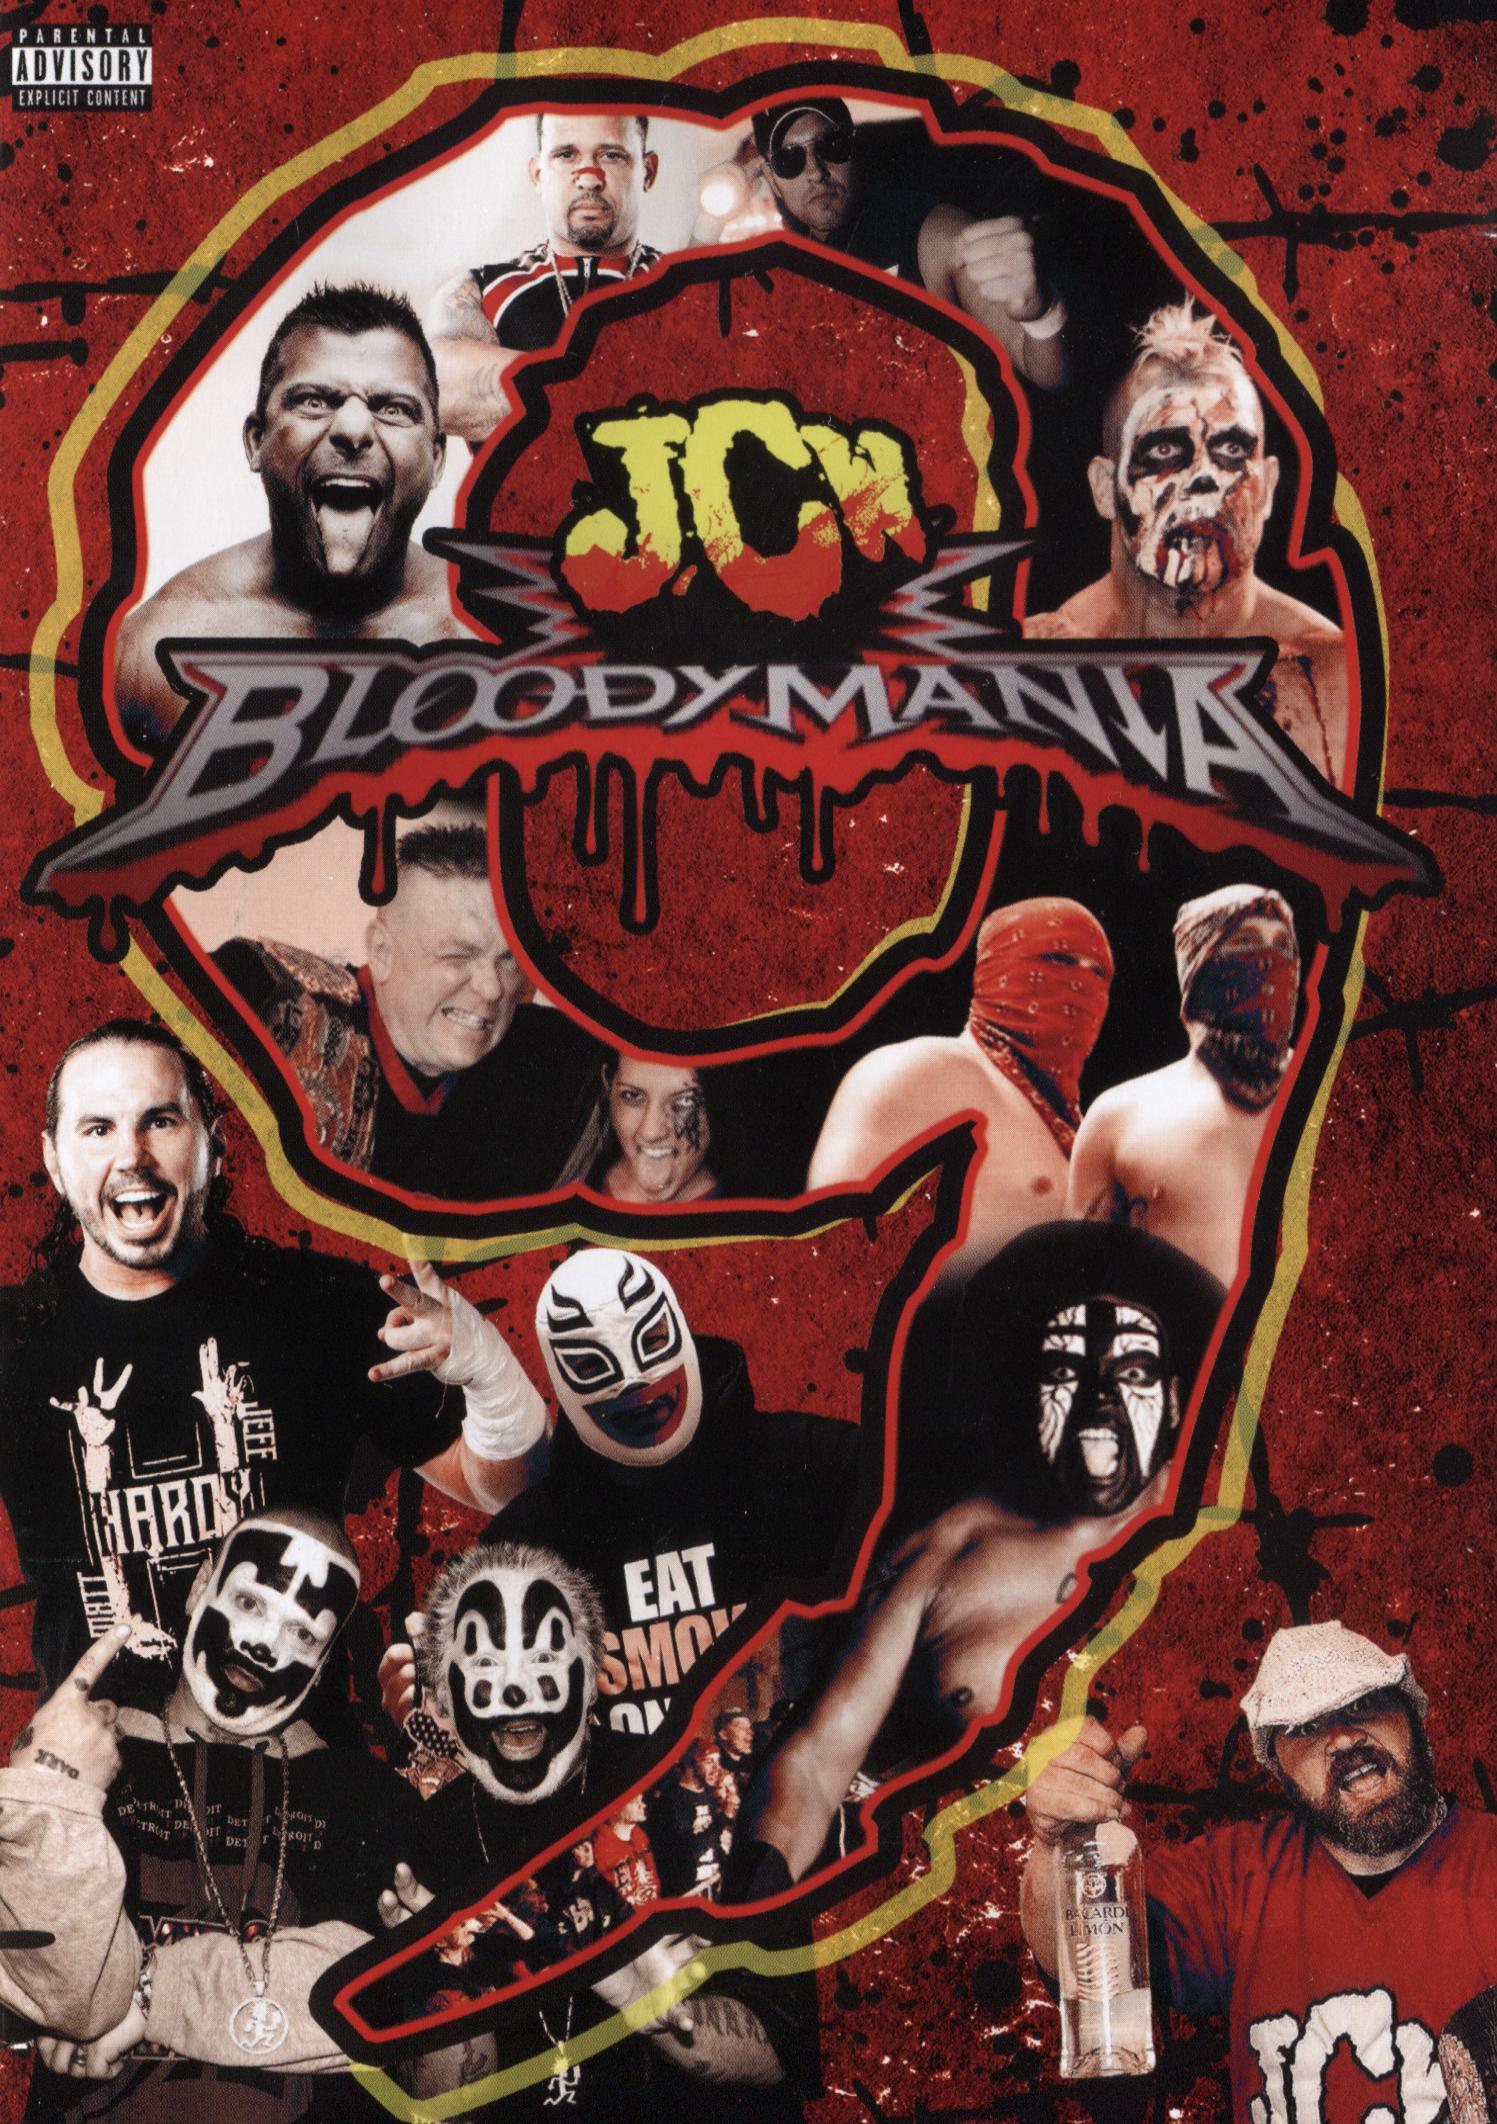 Juggalo Championship Wrestling: Bloodymania 9